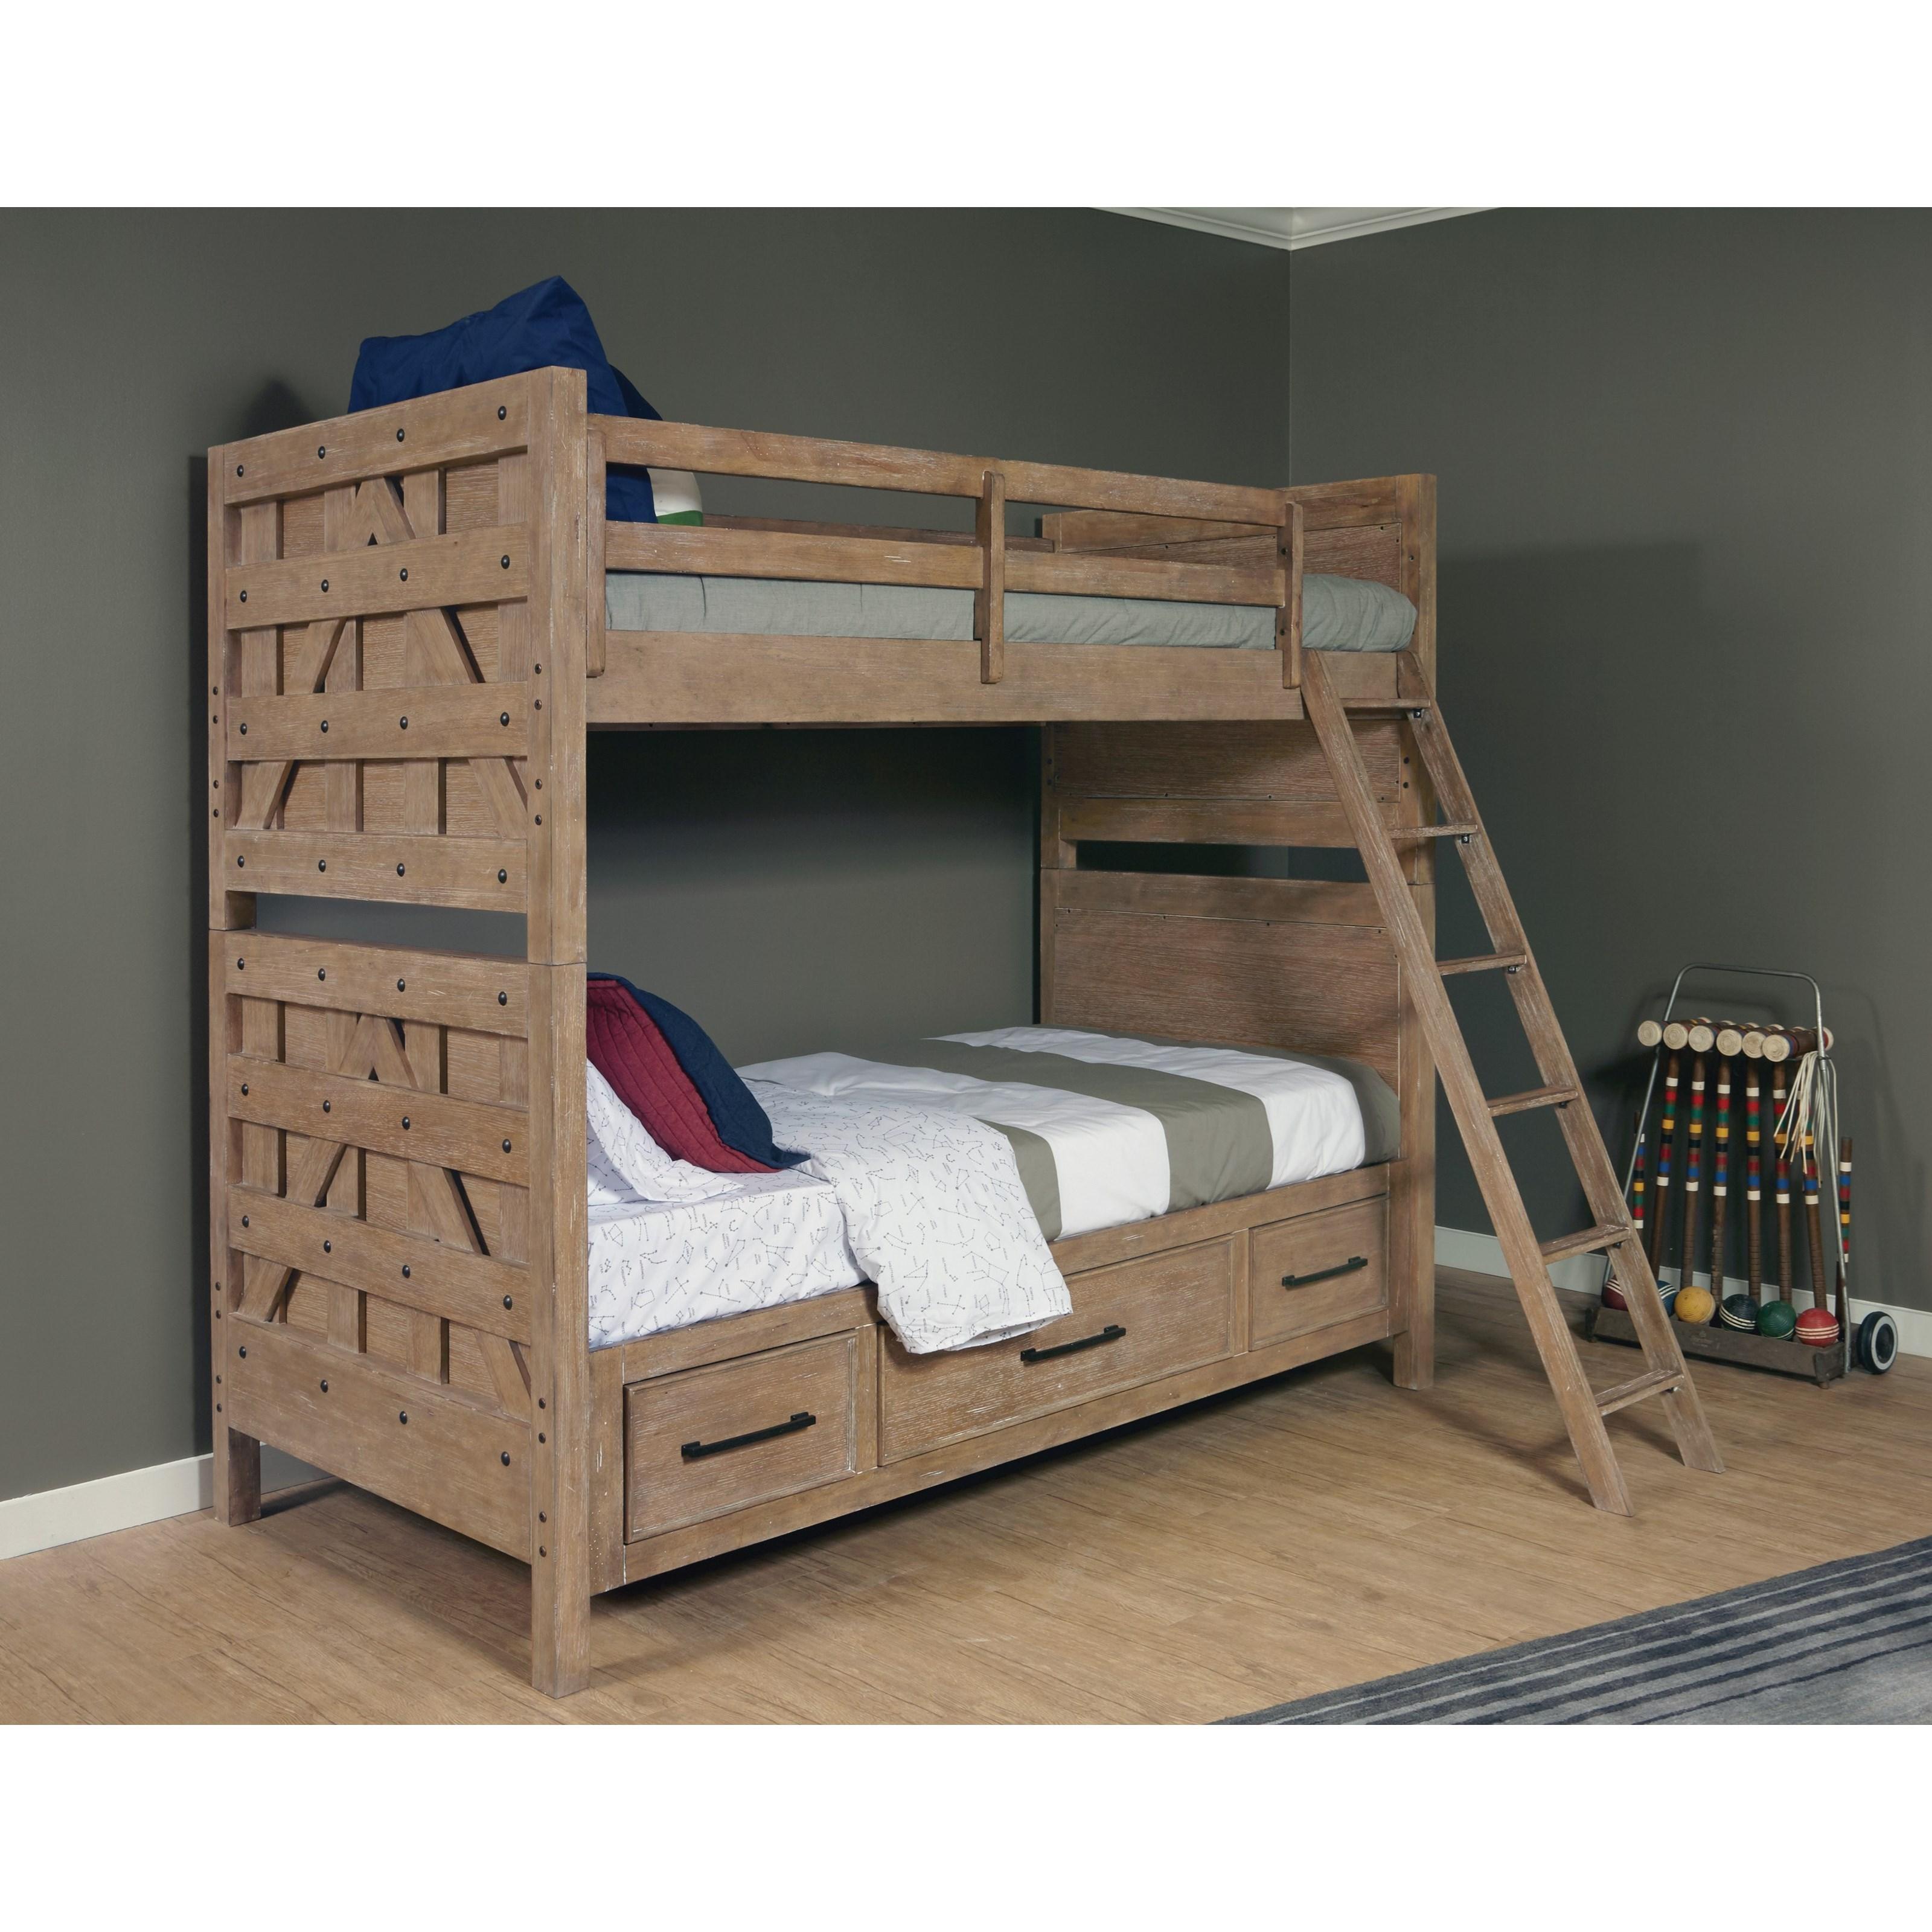 samuel lawrence austin bunk bed with trundle storage unit - Samuel Lawrence Furniture